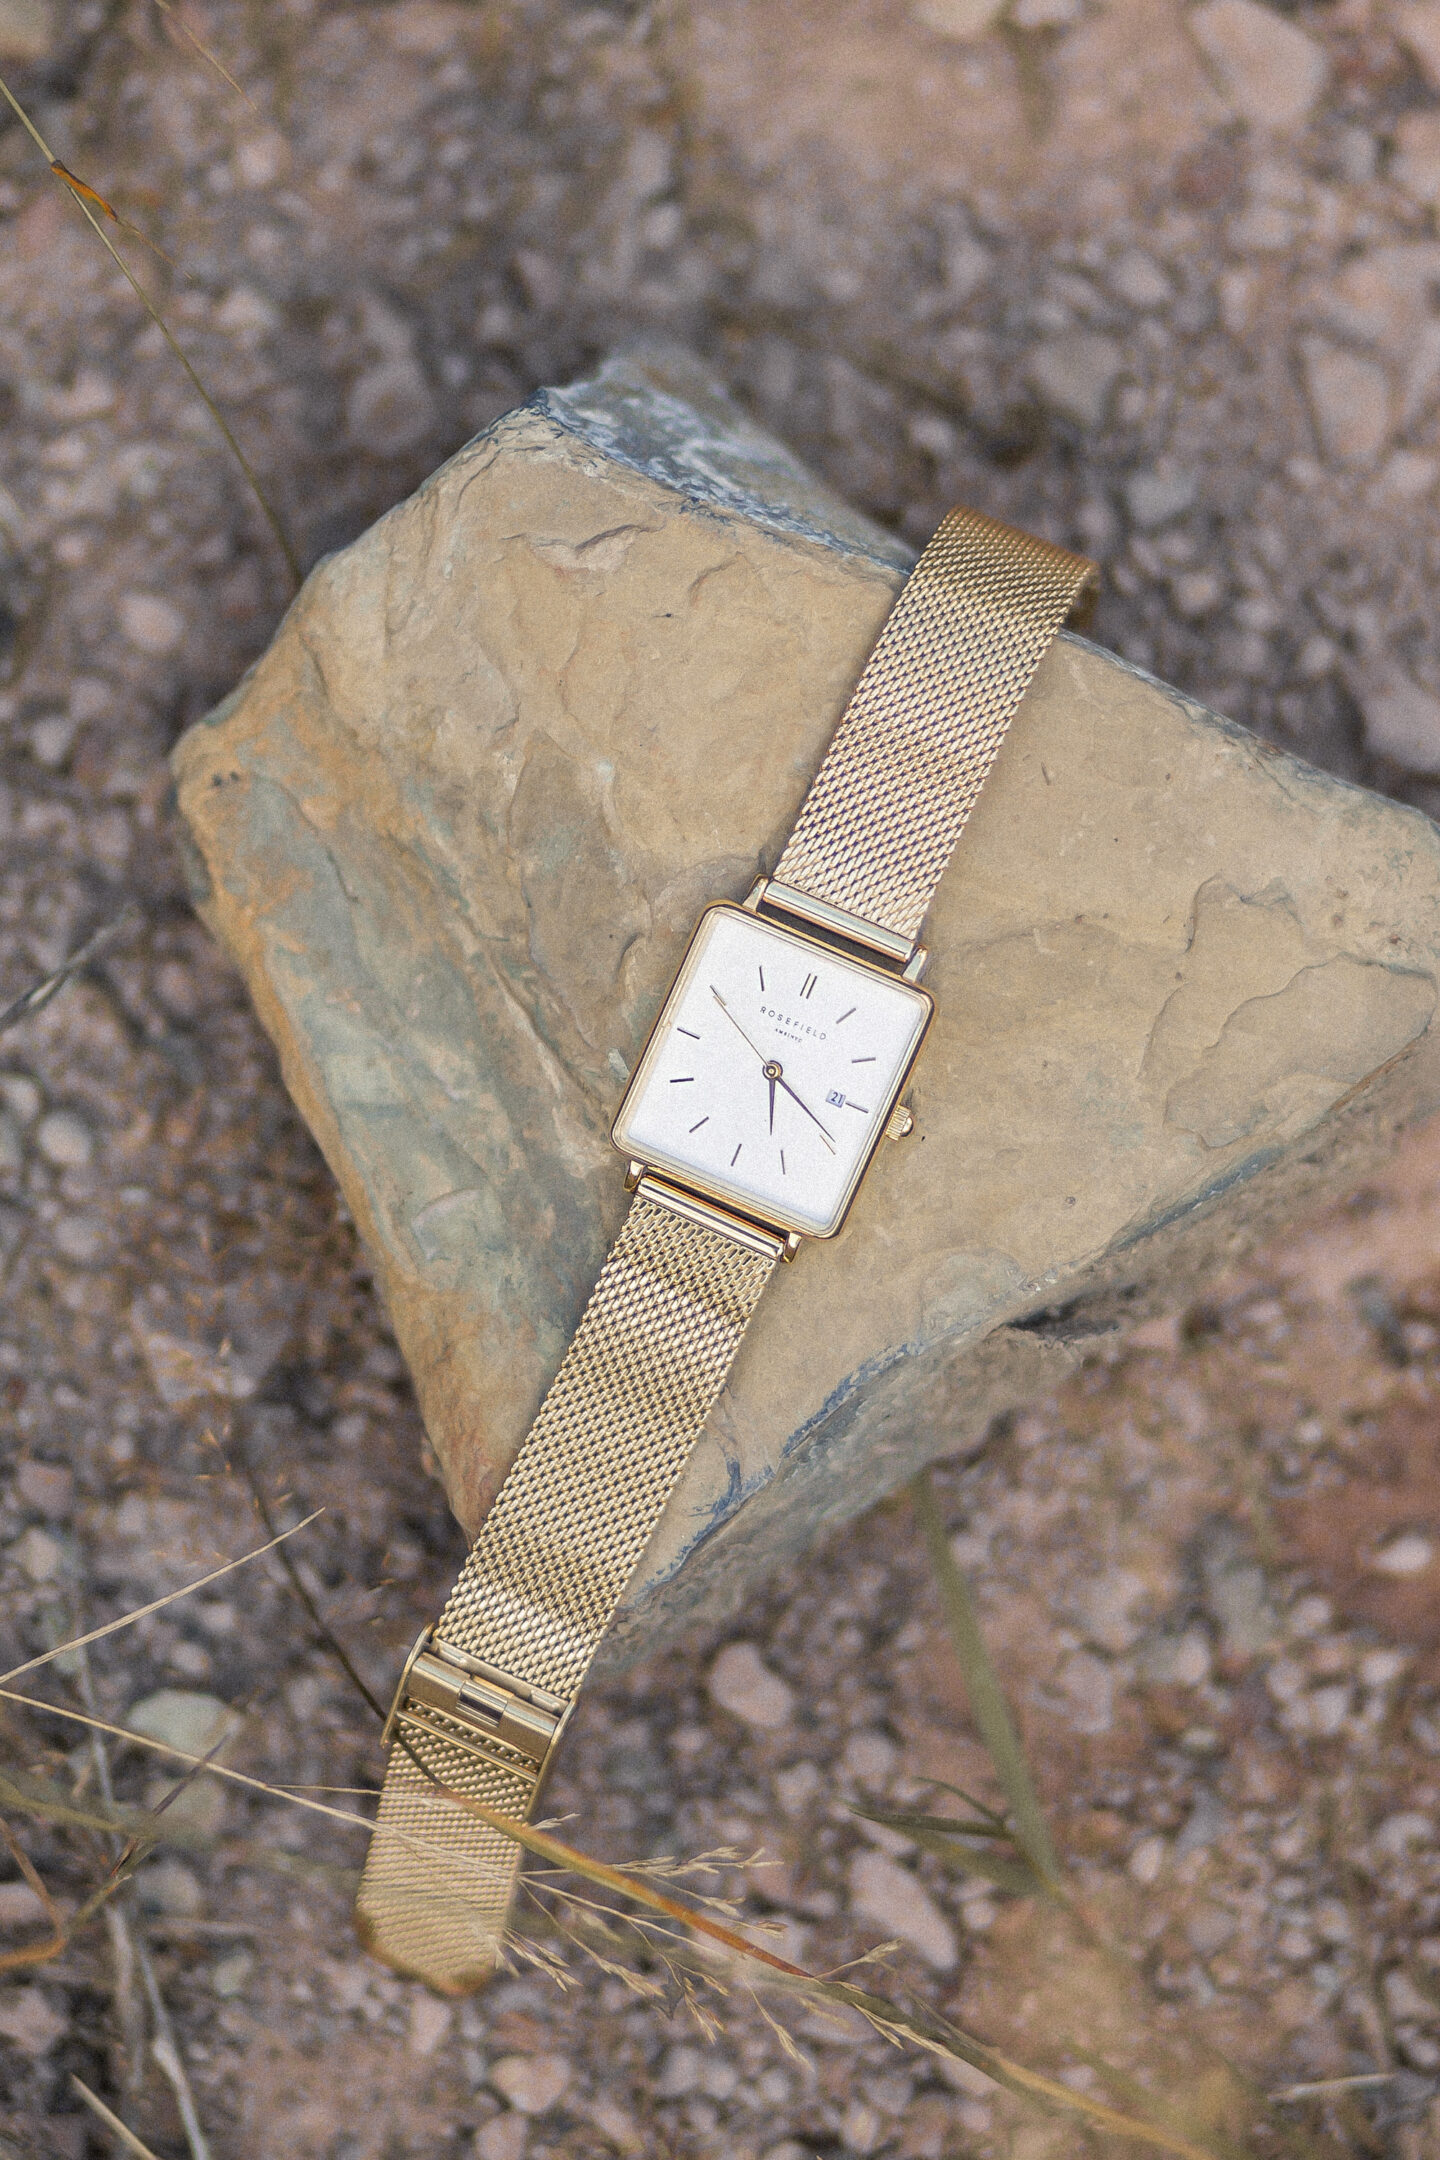 Uhren Klassiker, Damenuhren Trends, Rosefield Boxy Uhr, bezauberndenana